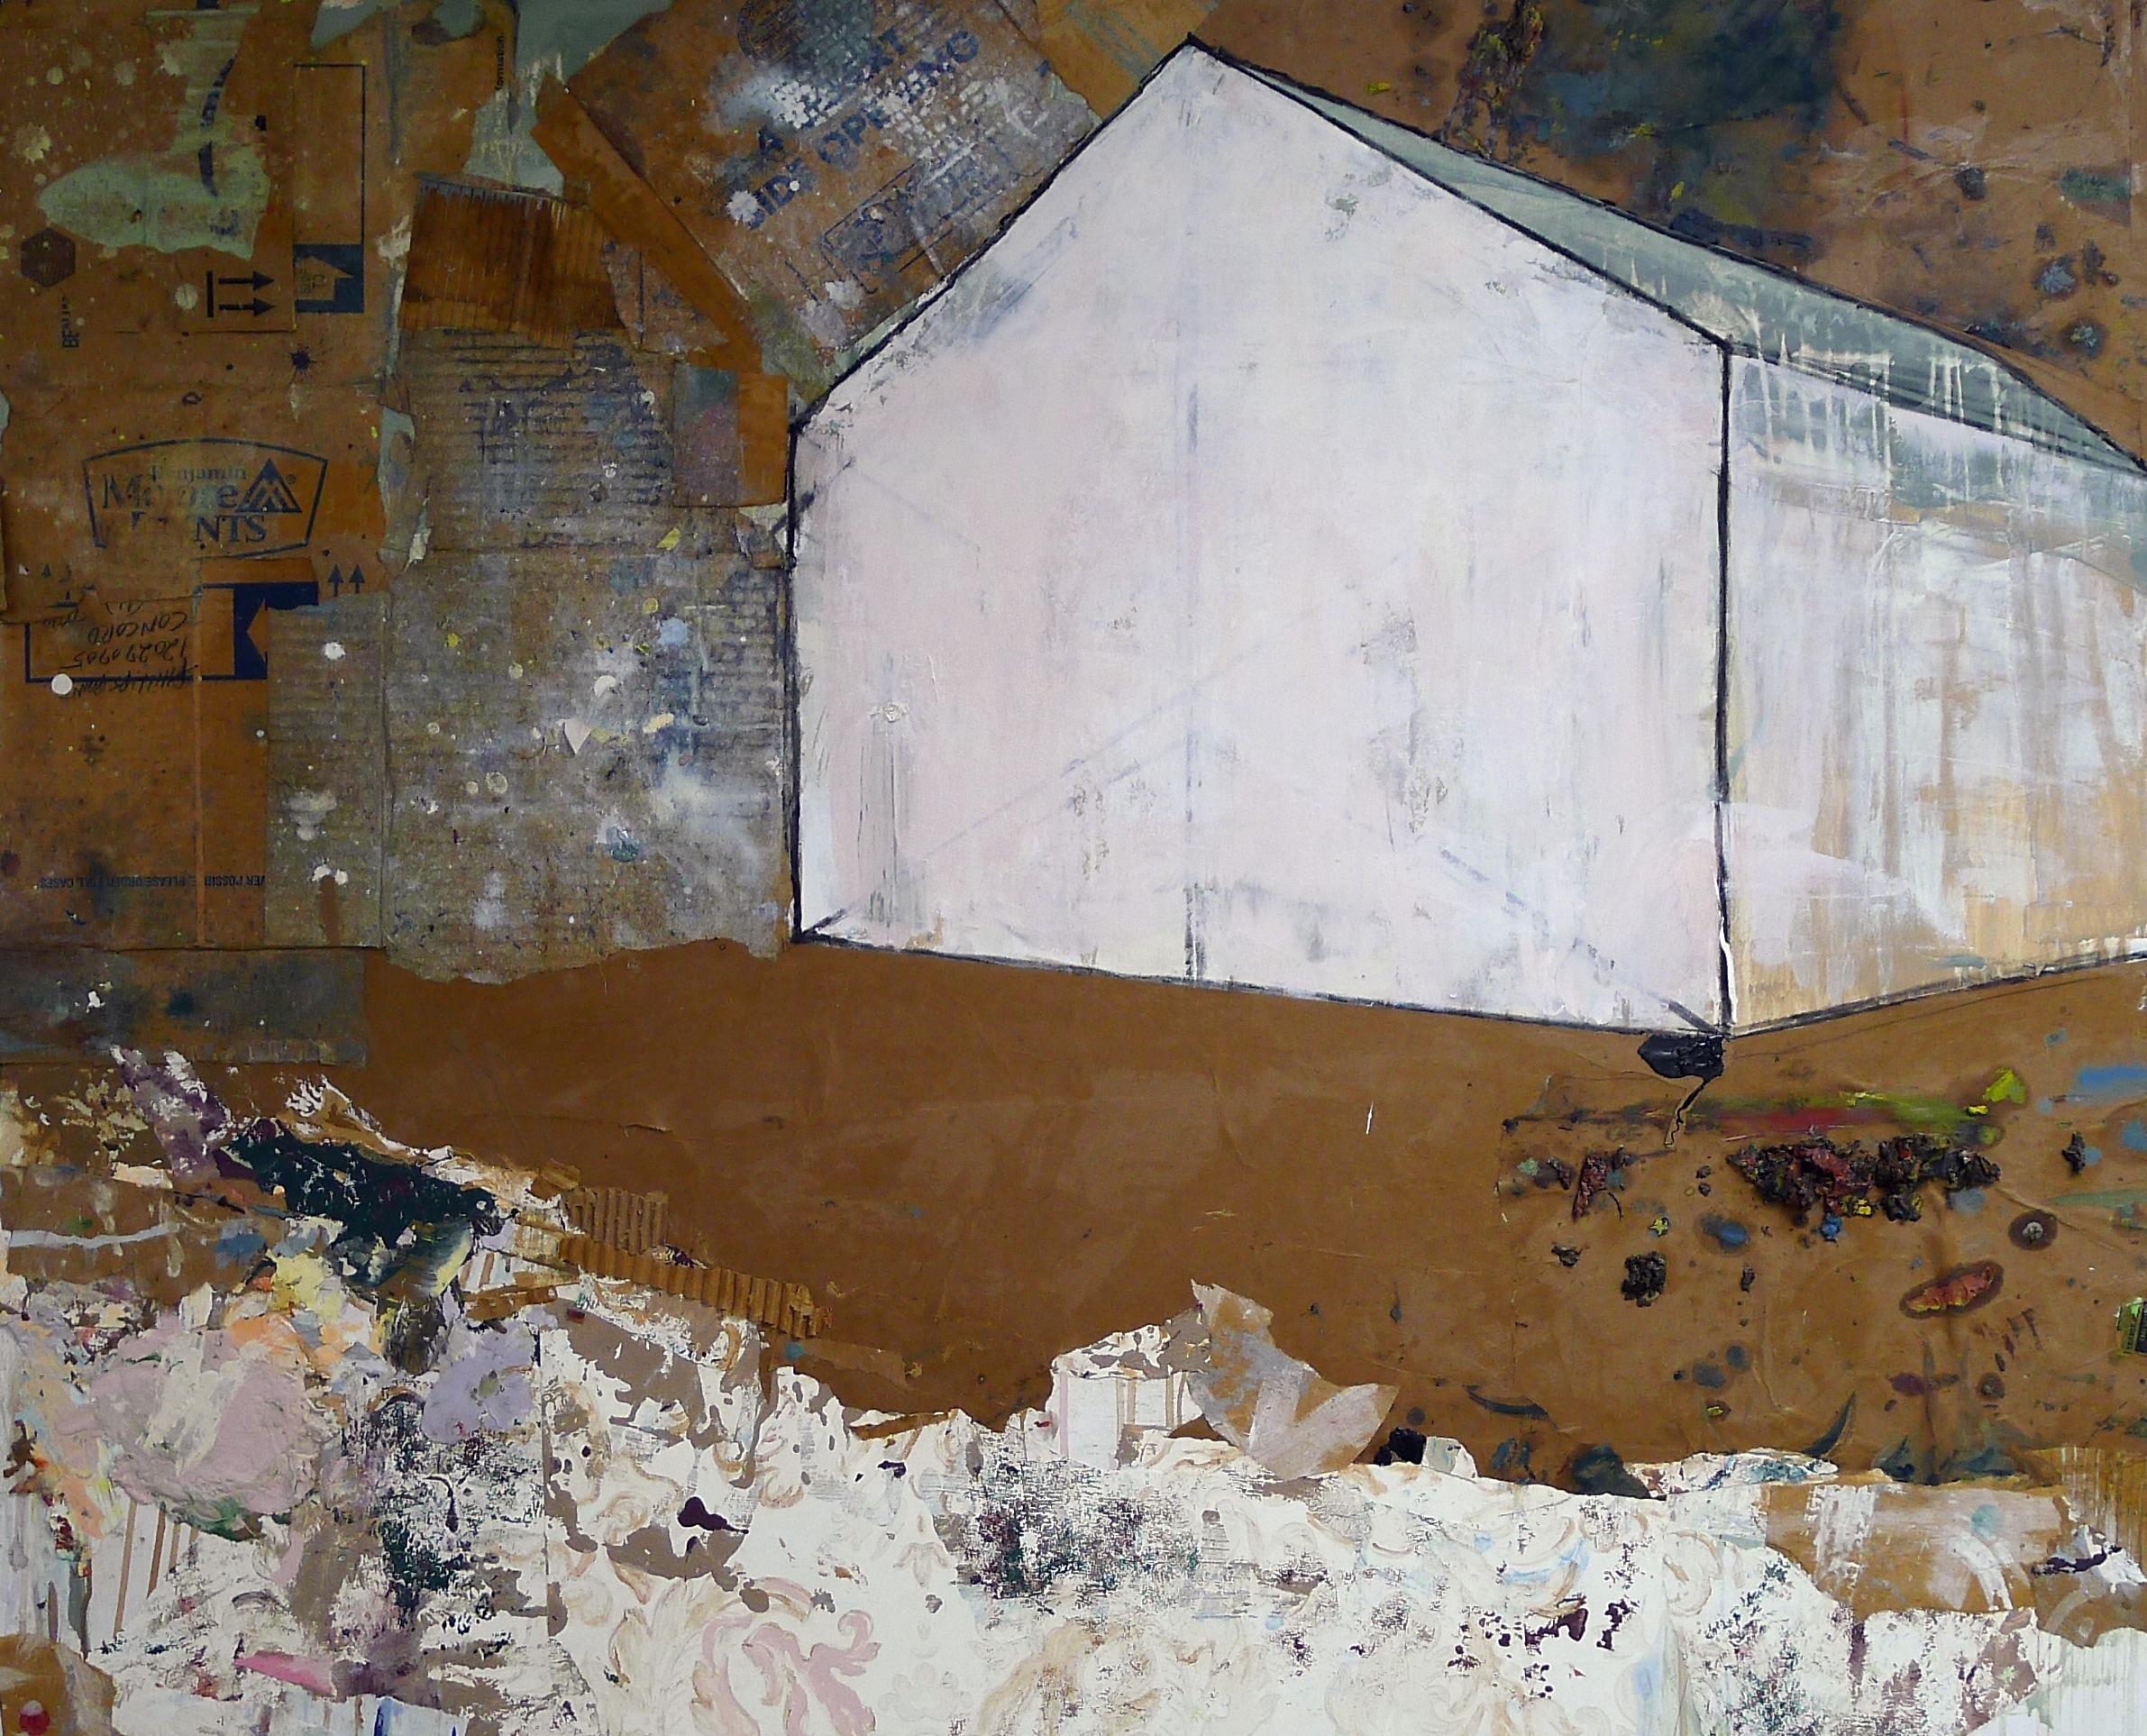 Brenda Cirioni,  Barn Series: Formation  Mixed media painting, 40x48